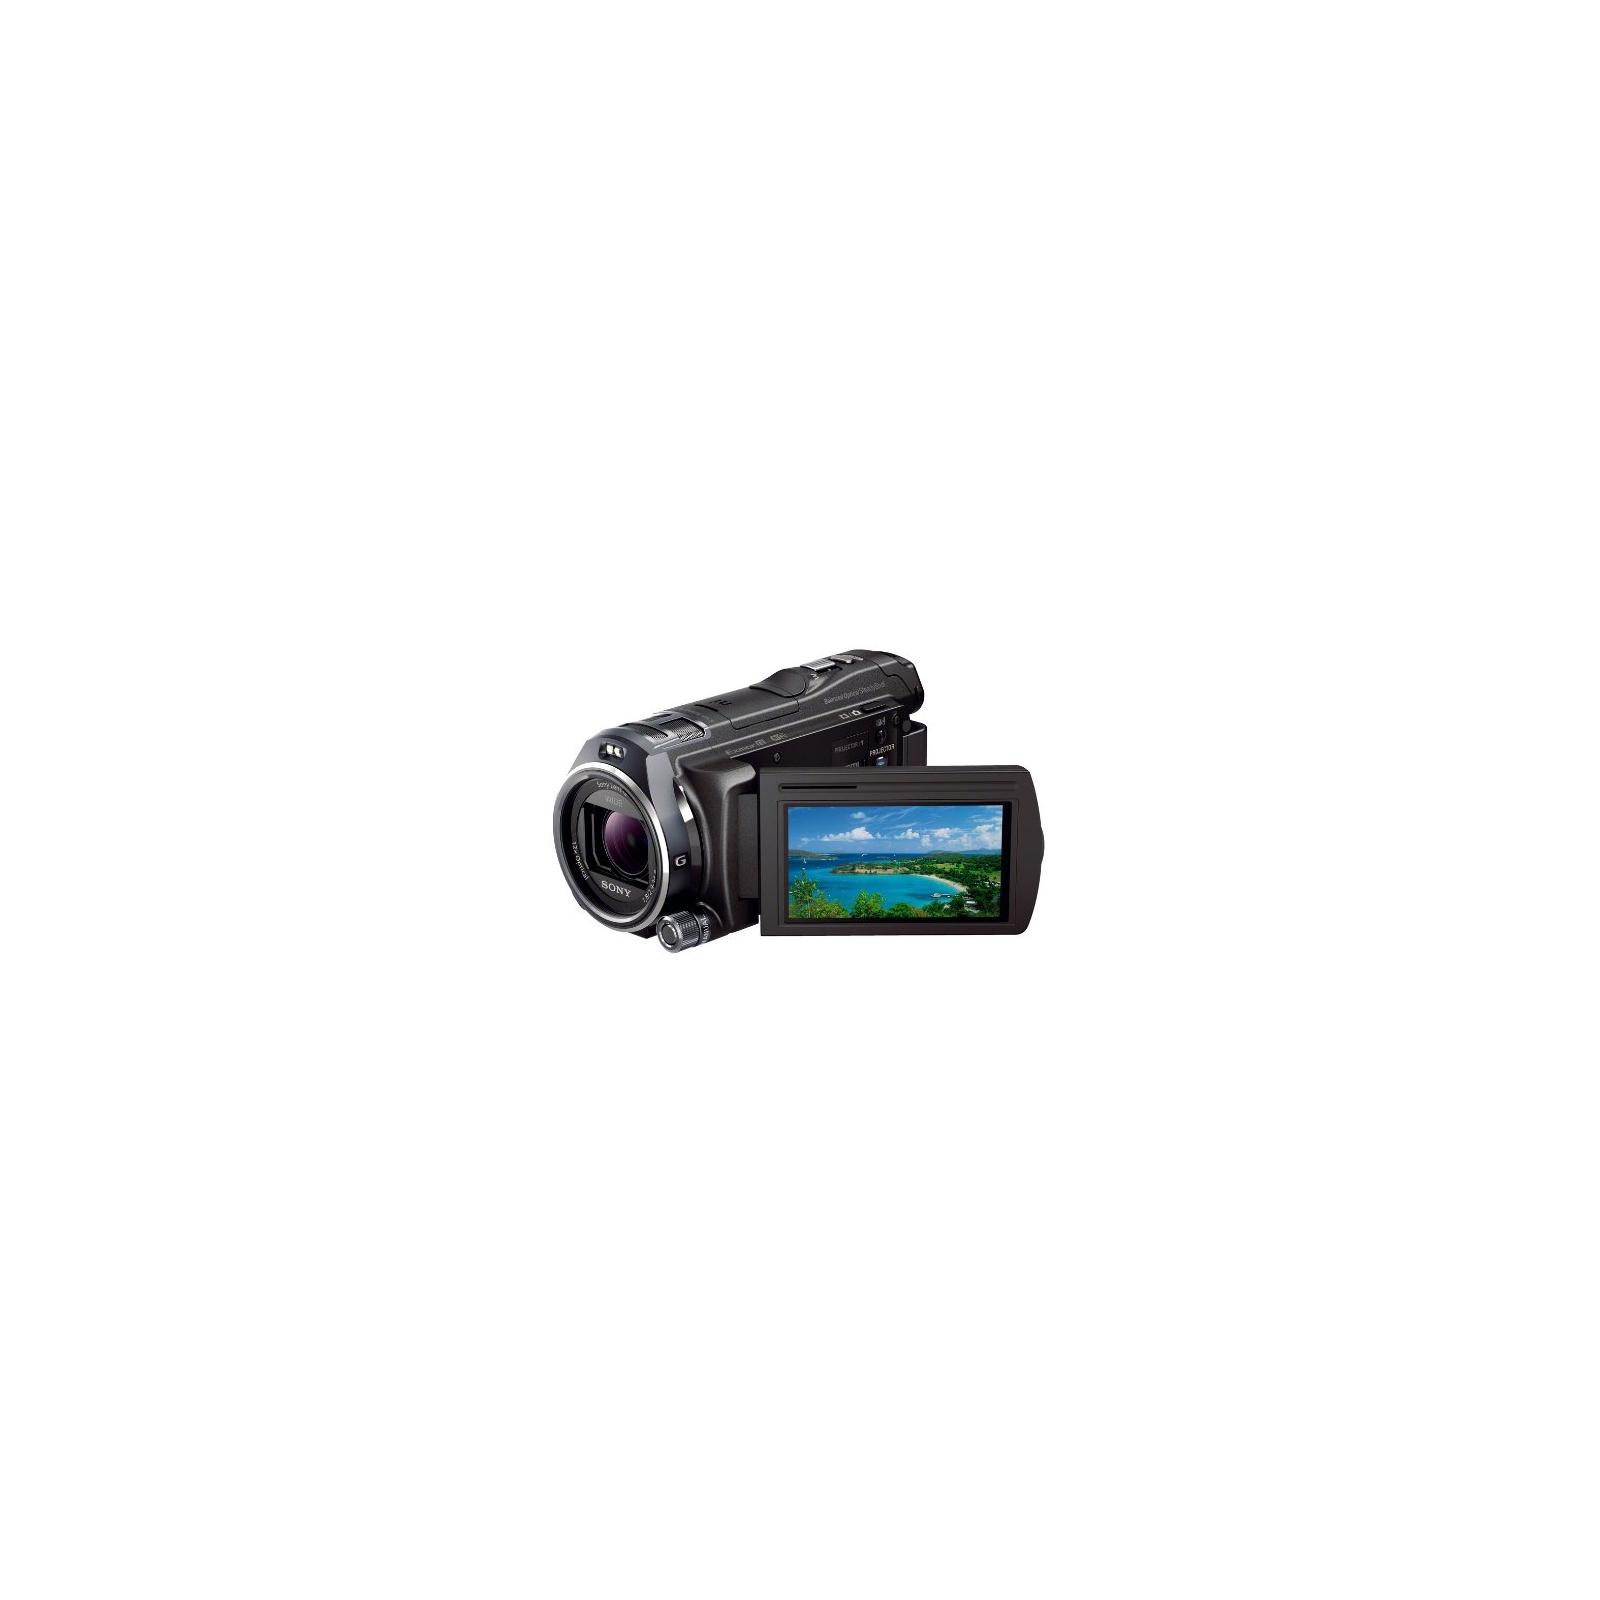 Цифровая видеокамера SONY Handycam HDR-PJ810 Black (HDRPJ810EB.CEL) изображение 3